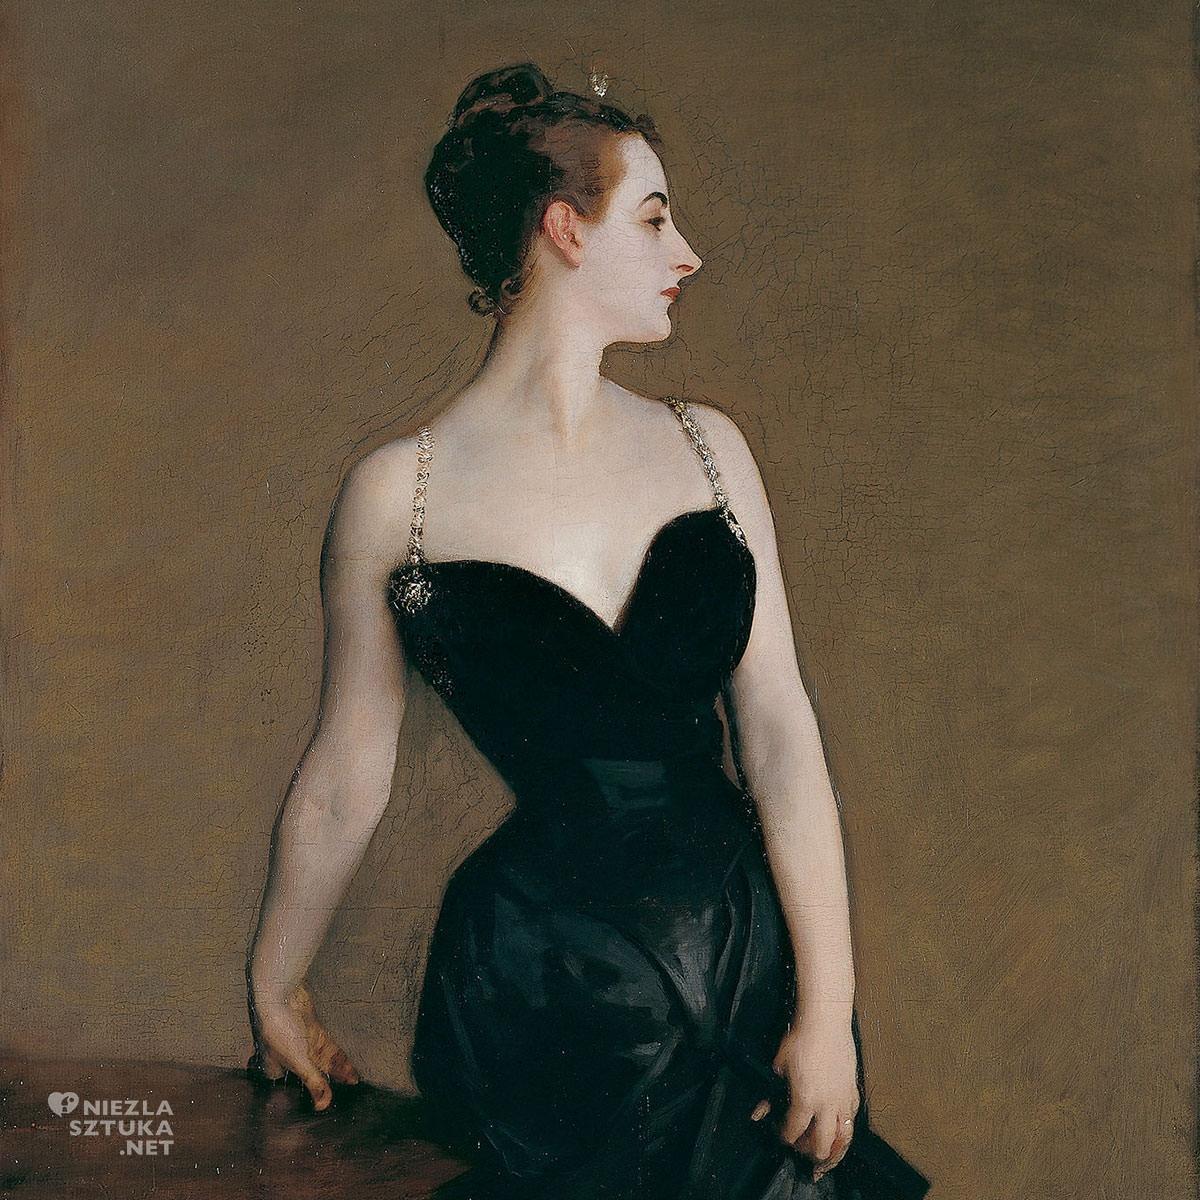 John Singer Sargent, Portret Madame X Madame Pierre Gautreau John Singer Sargent Metropolitan Museum of Art, MET, Nowy Jork, Niezła sztuka